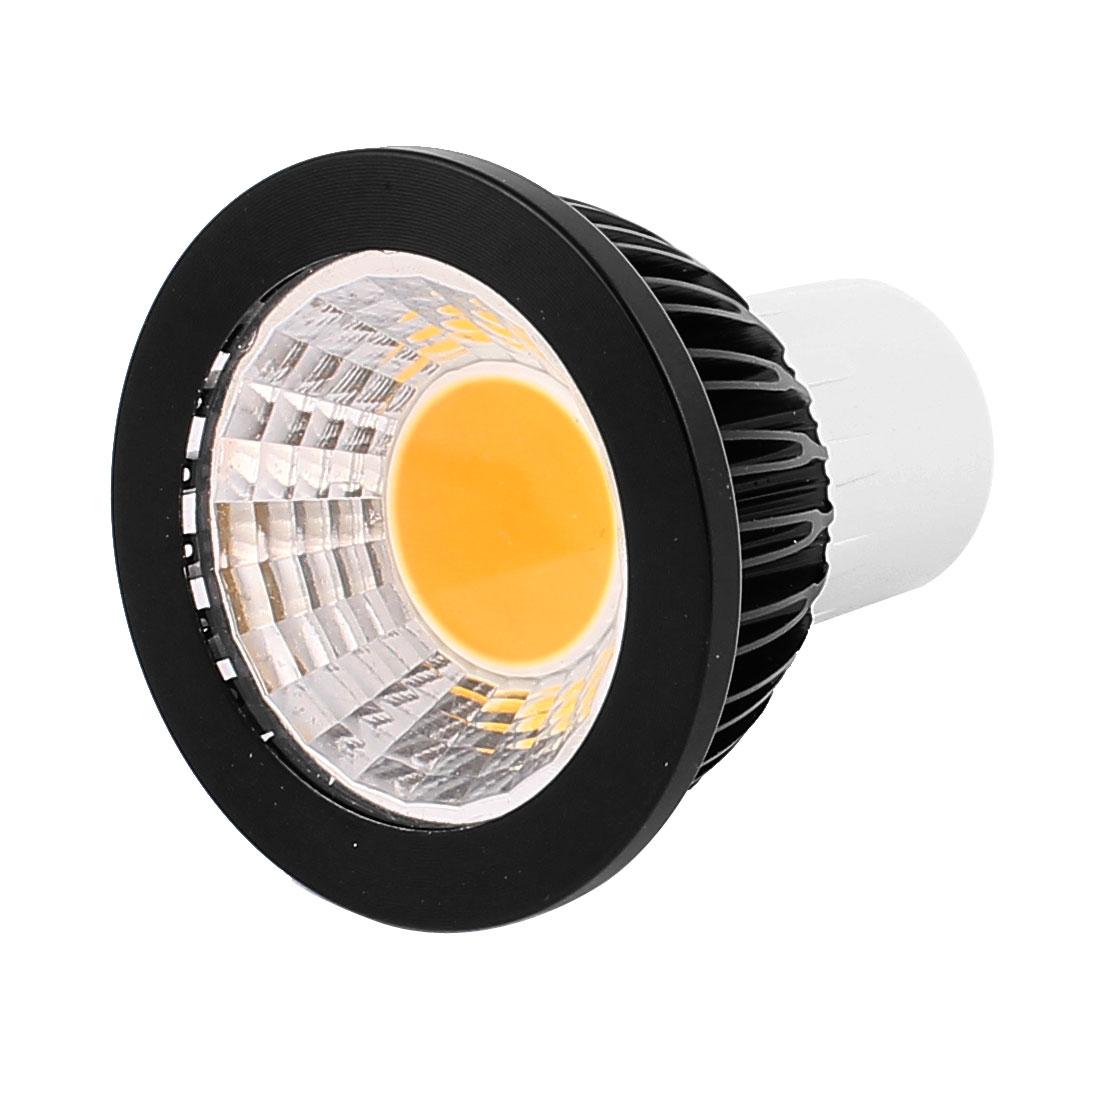 AC85-265V 3W GU5.3 COB LED Spotlight Lamp Bulb Energy Saving Downlight Warm White